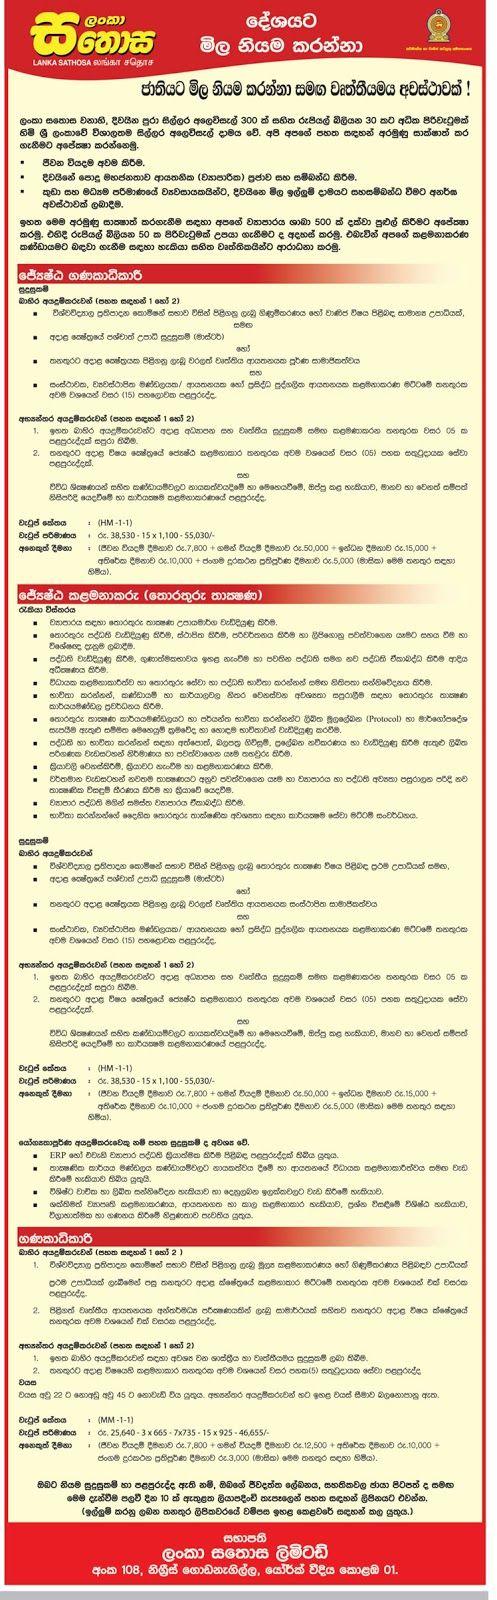 Sri Lankan Government Job Vacancies at Lanka Sathosa Ltd for Senior Accountants, Accountants, Senior Managers (IT)